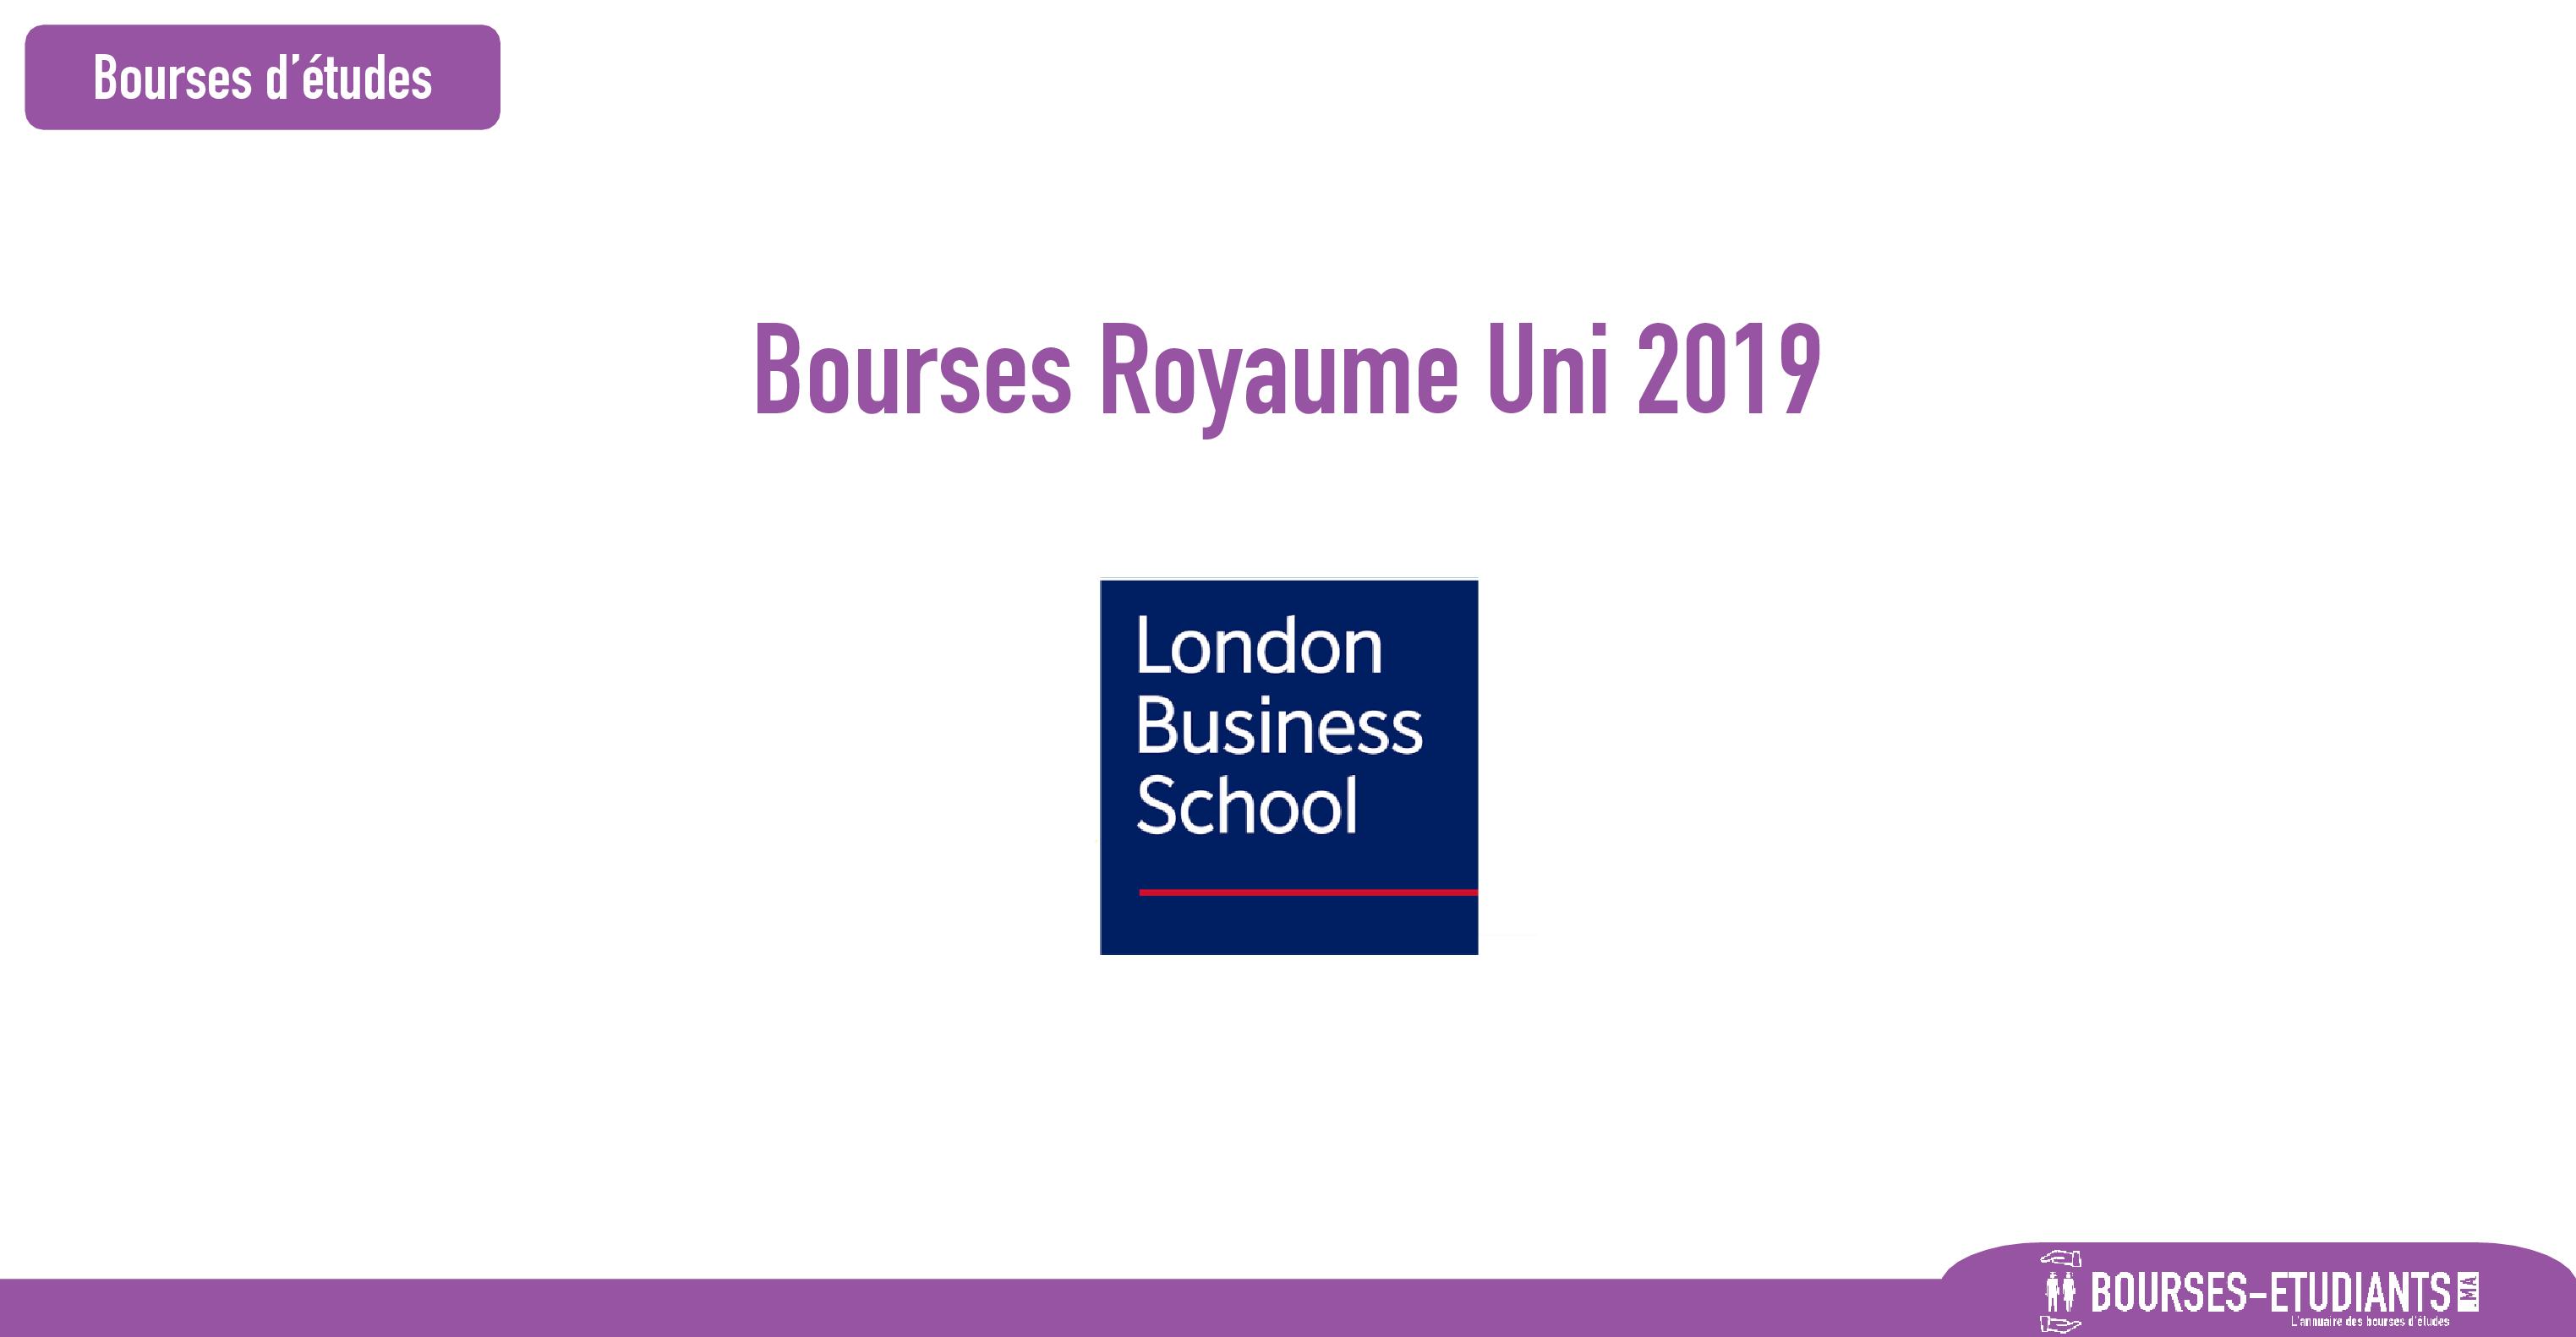 bourse London Business School